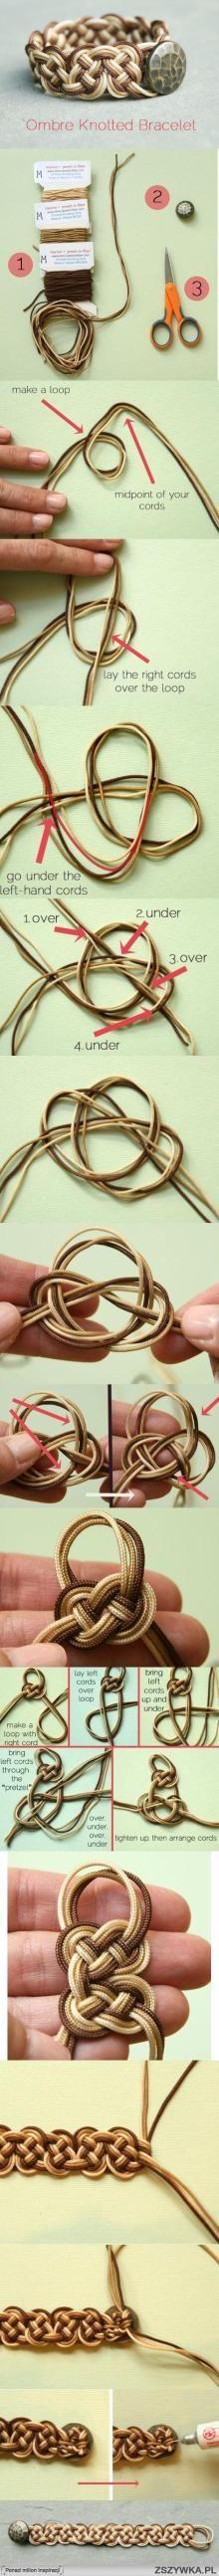 DIY Tutorial: Bracelets / DIY Bracelets - Bead